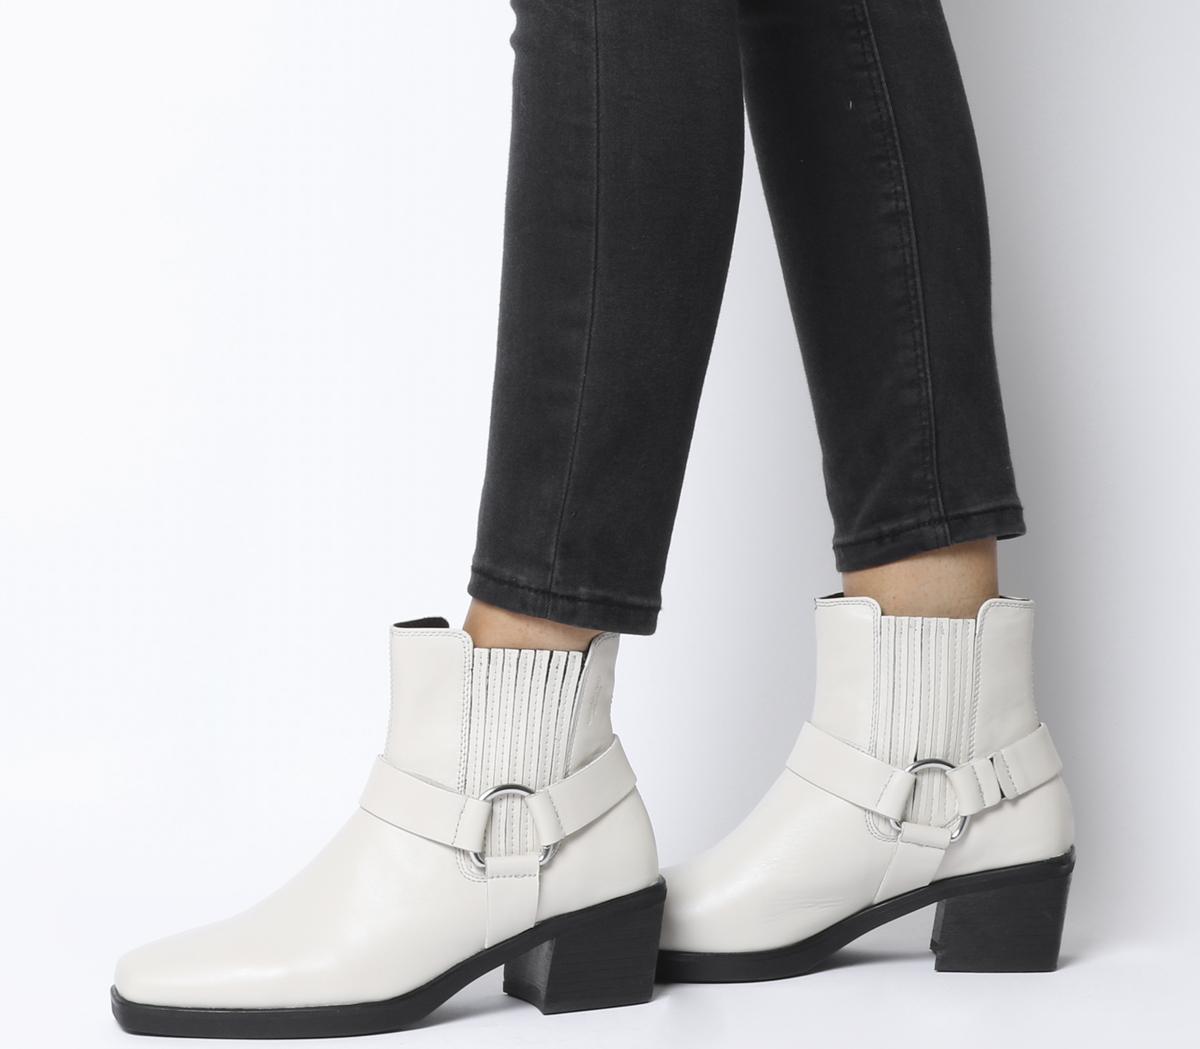 083b640db3b Sentinel Womens Vagabond Simone Harness Boots Off White Leather Boots